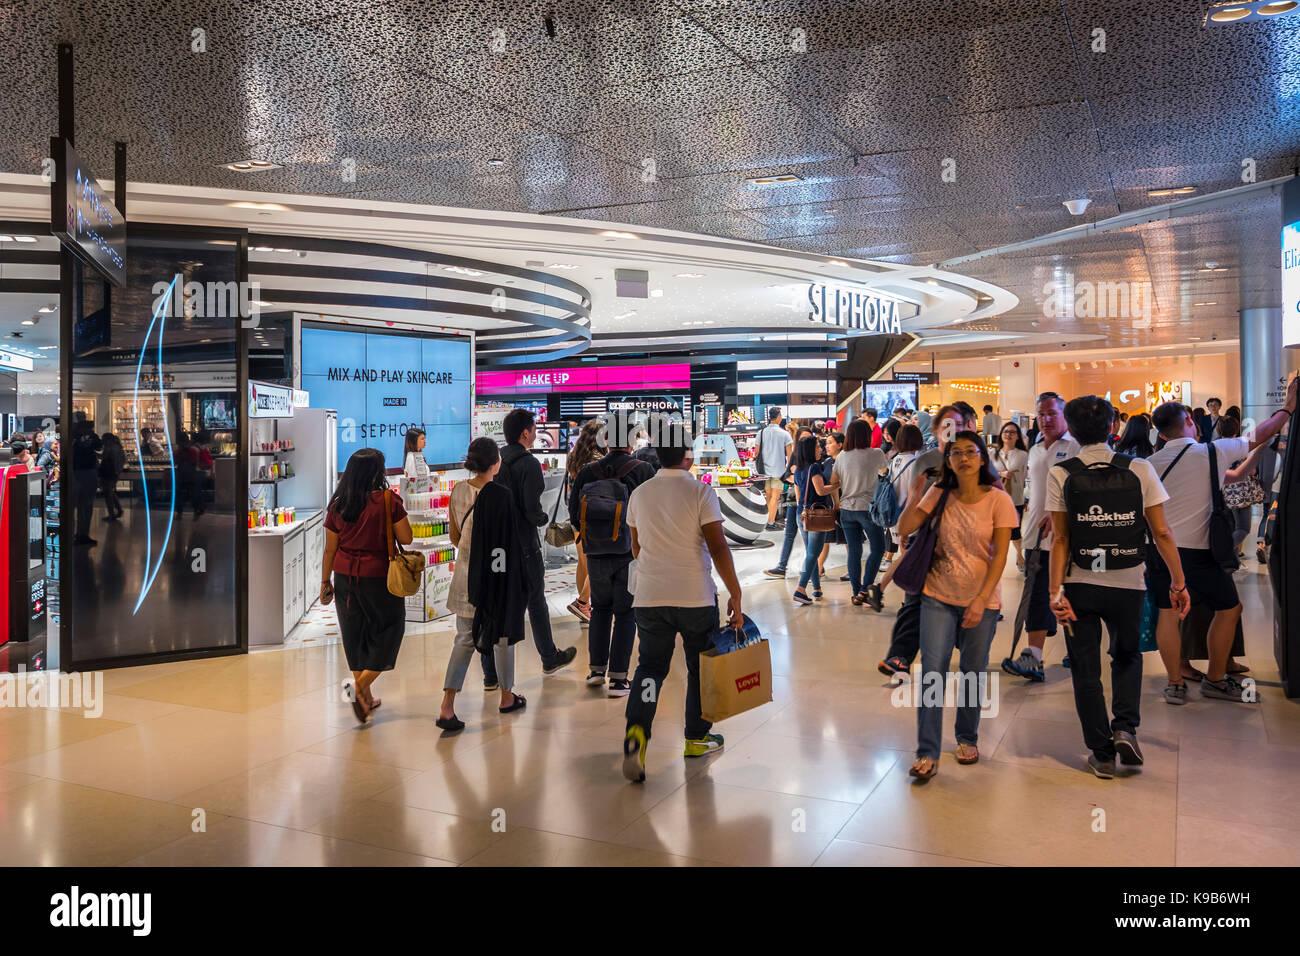 Sephora Kosmetik Shop, ion Shopping Mall, Singapur Stockbild